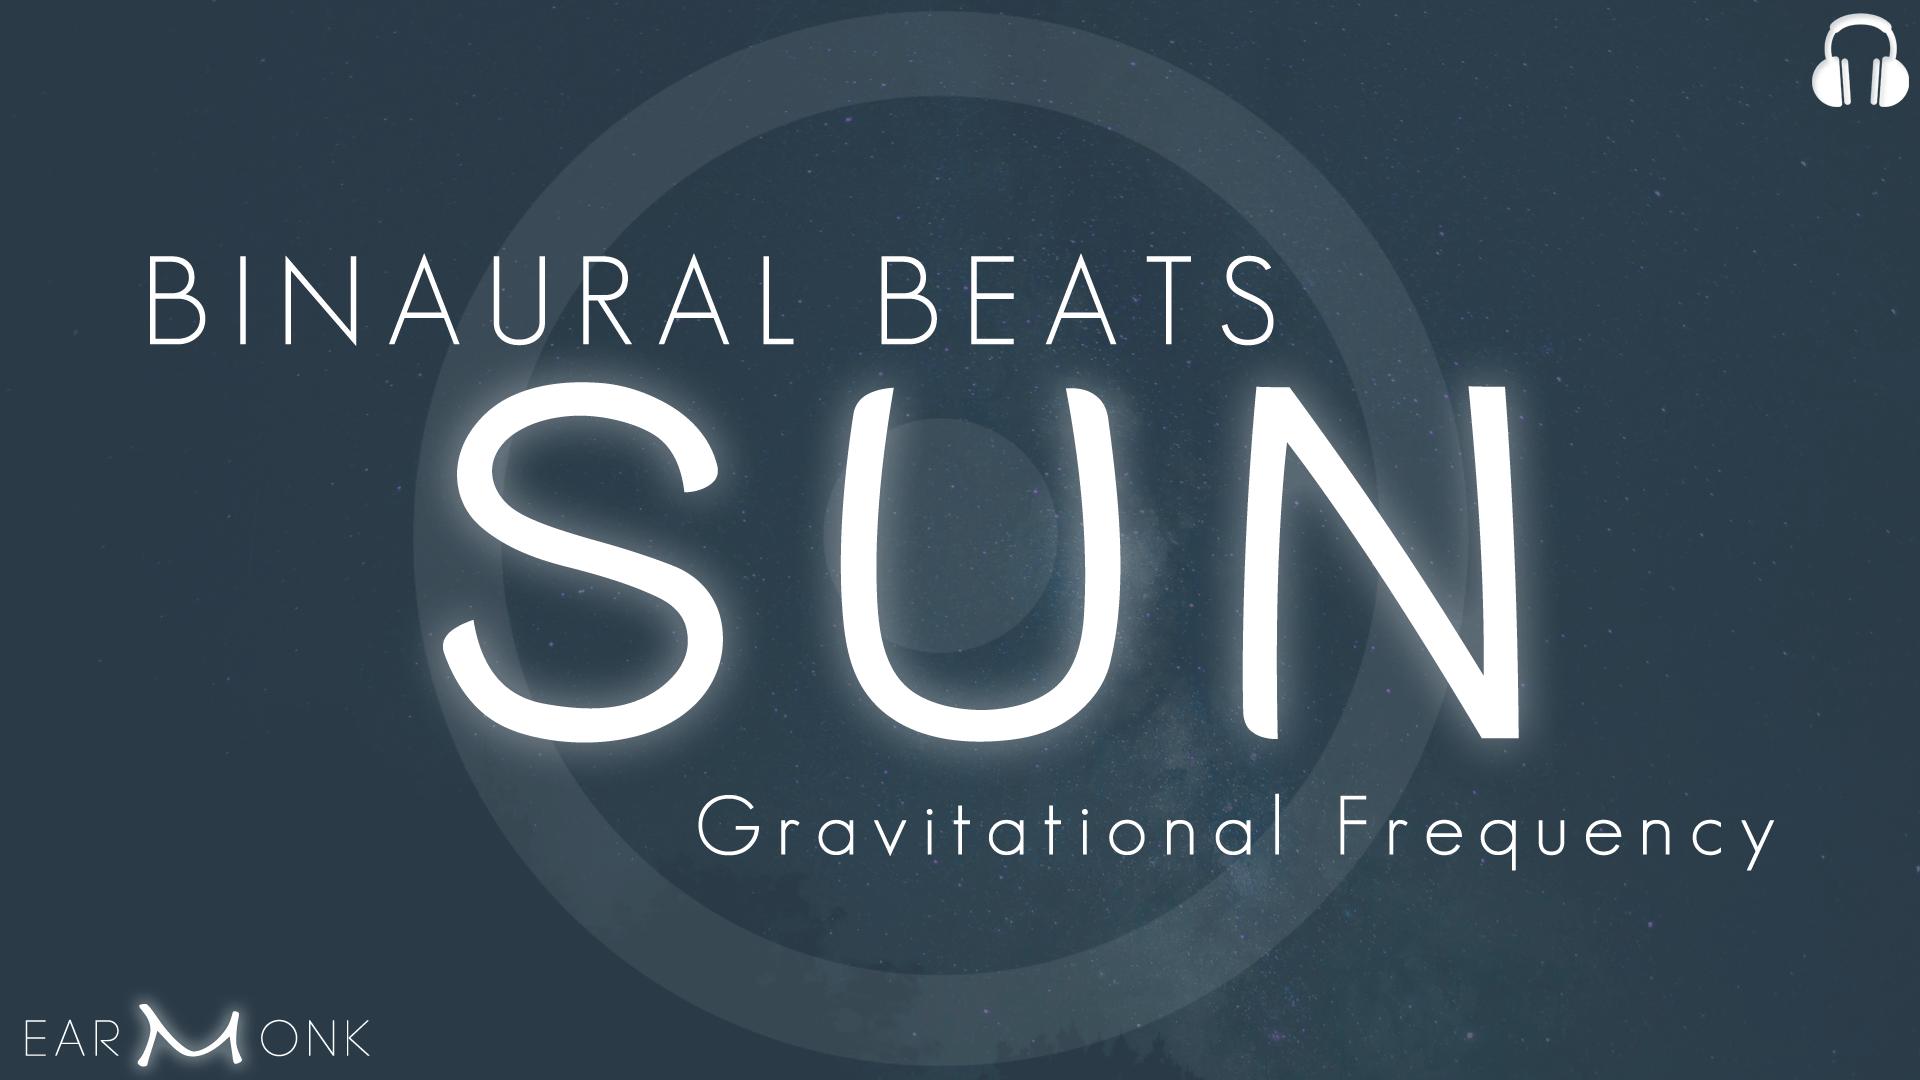 Theta Binaural Beats sun frequency